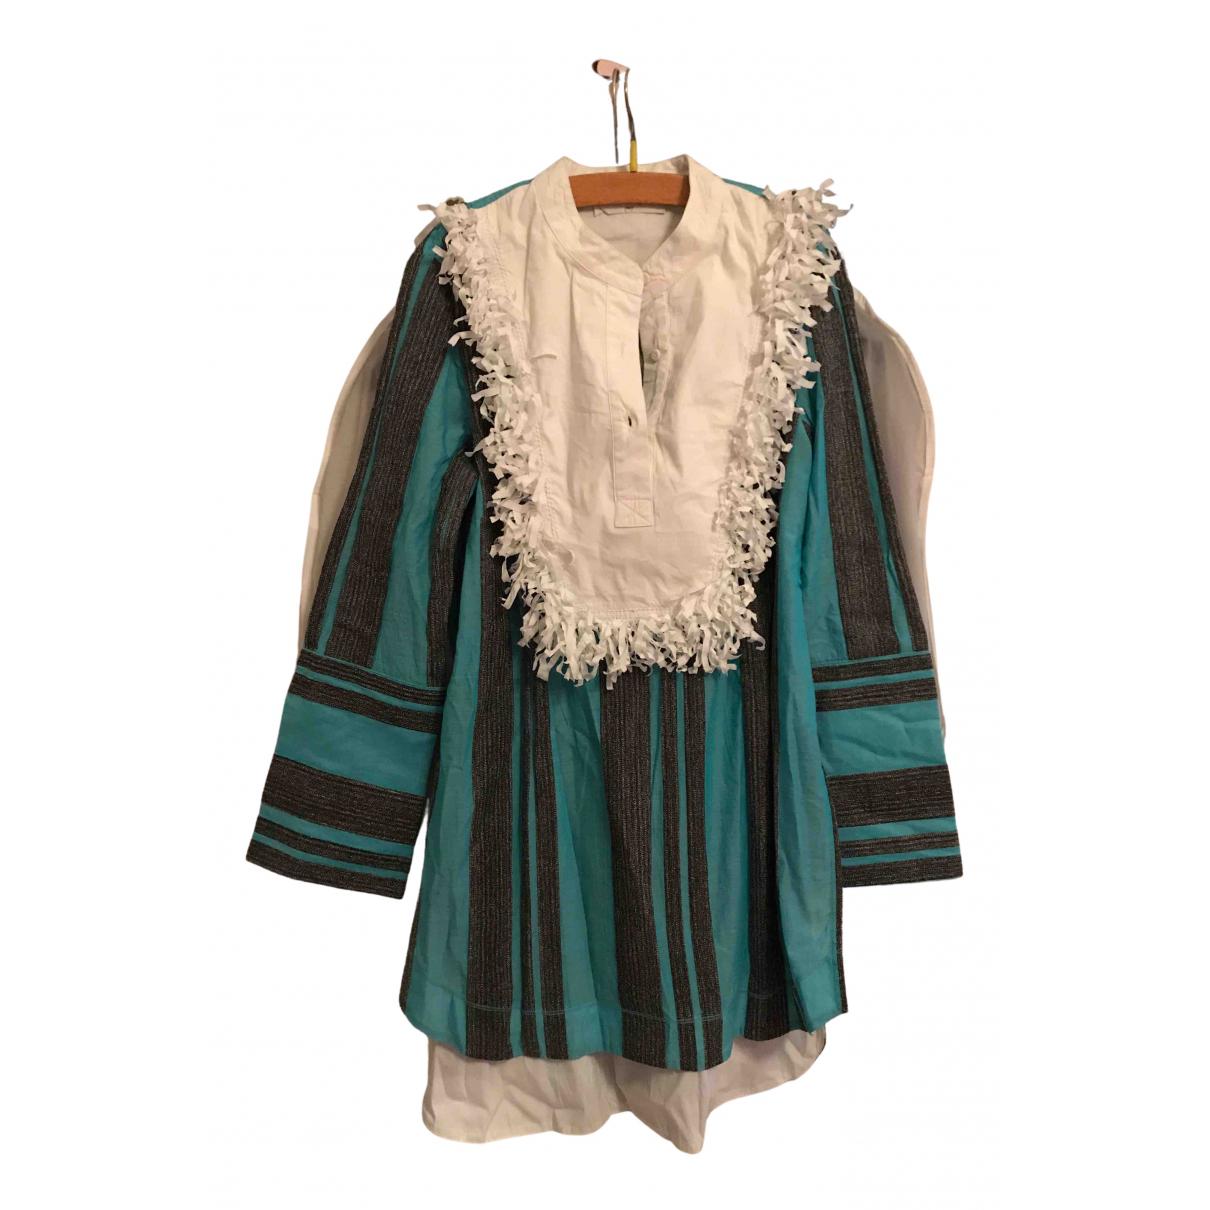 Maria Grazia Severi \N Kleid in  Gruen Baumwolle